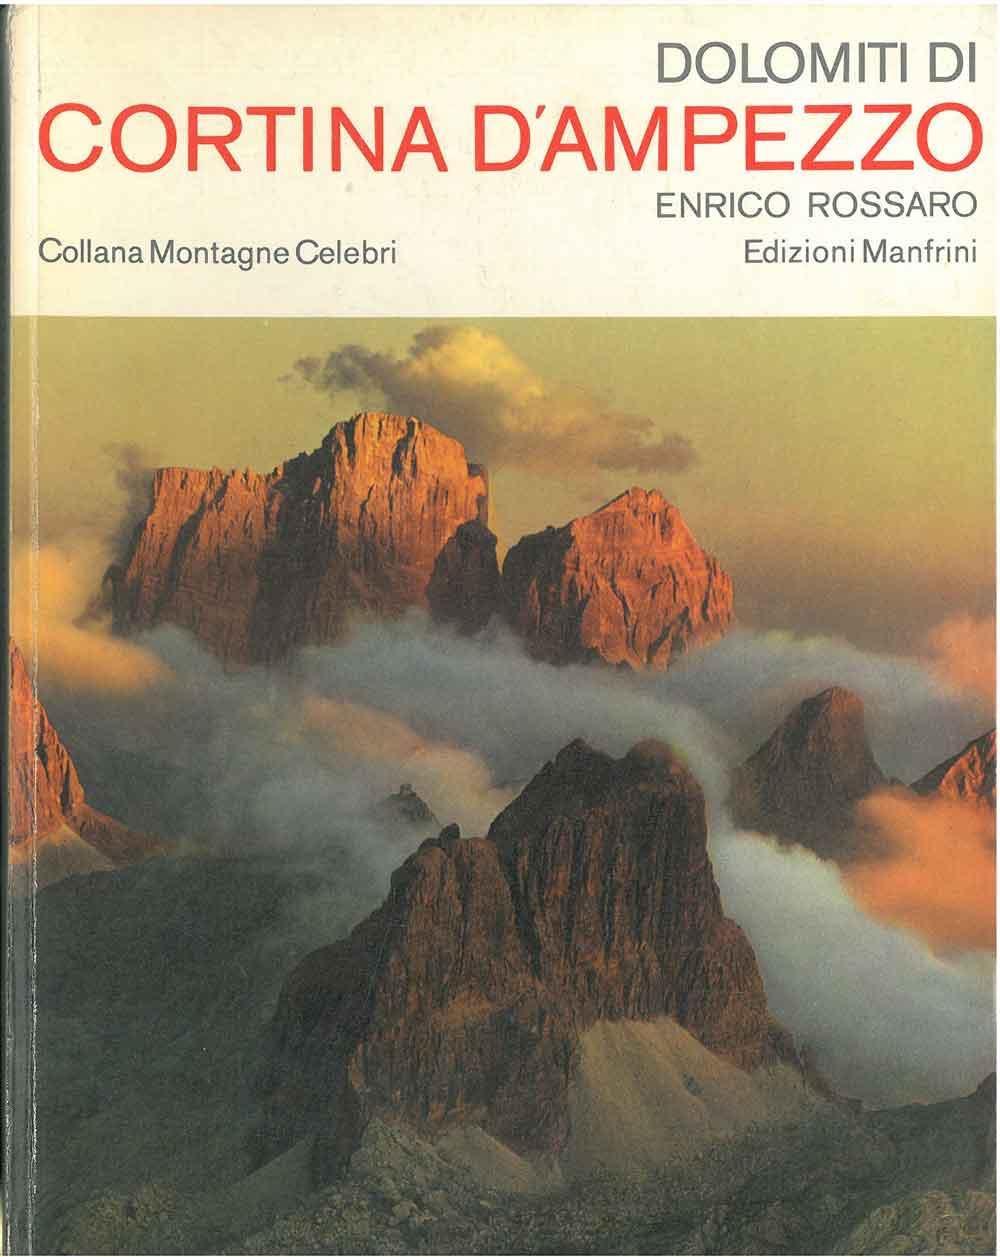 Dolomites Of Cortina Dampezzo _ ENRICO ROSSARO